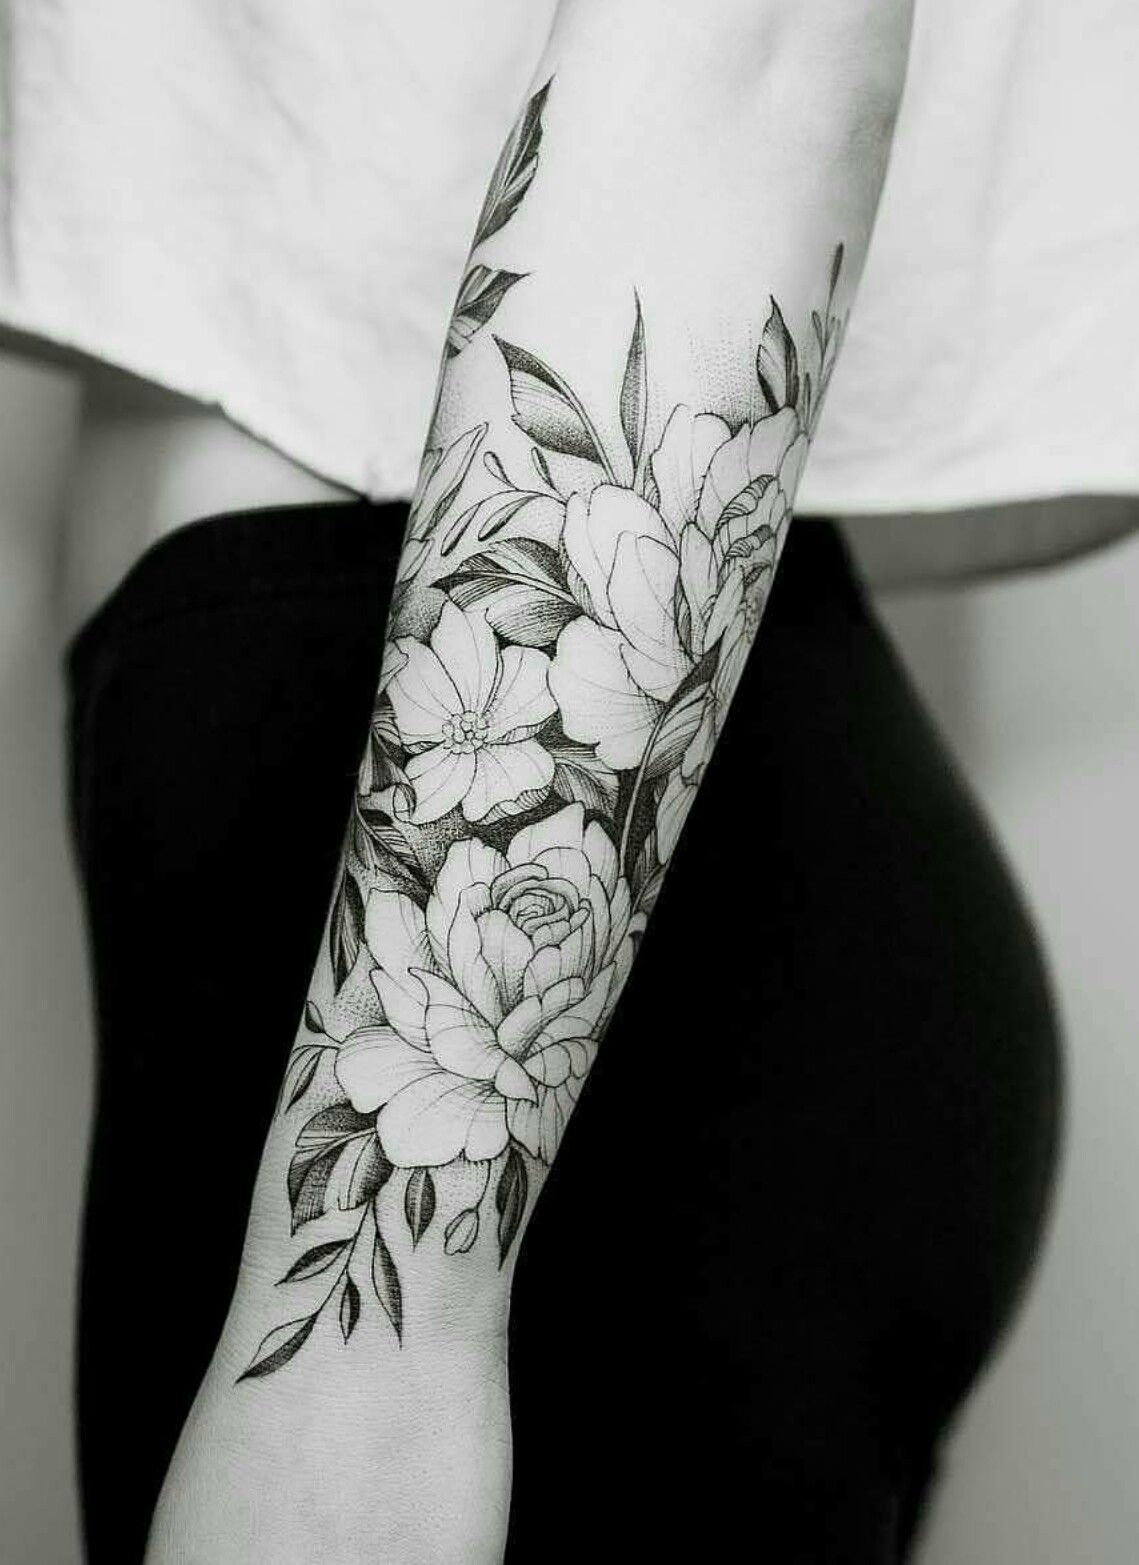 Flower Sleeve Tattoo Forearm: Idea By Vanessa Gadsby On Tattoos